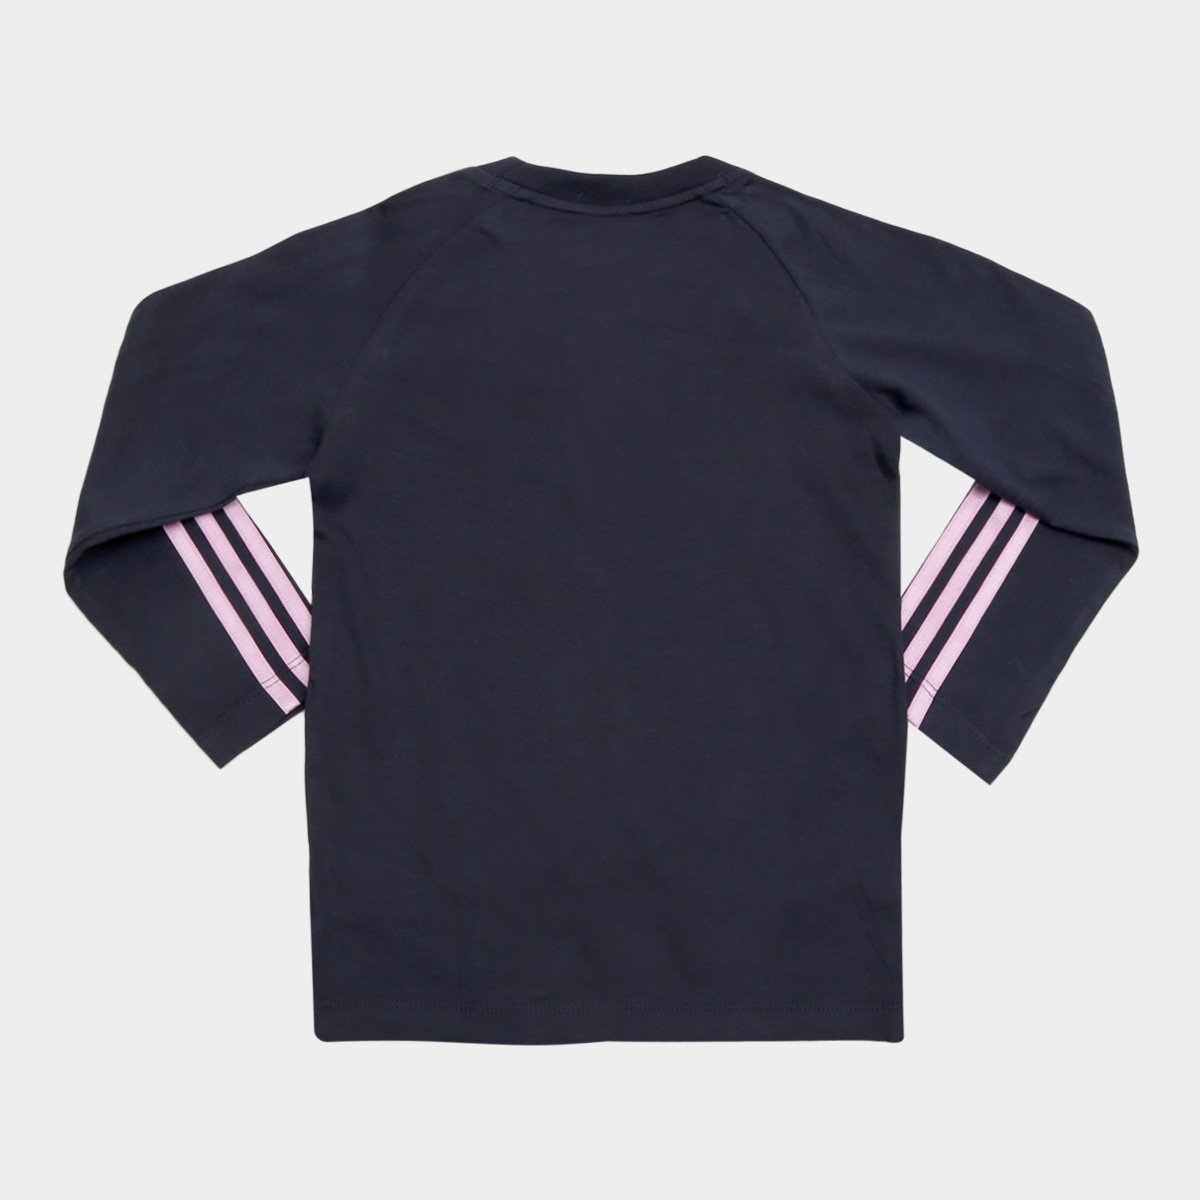 Camiseta Infantil Azul Adidas Ls Feminina Manga 3 Stripes Longa vv8dwq